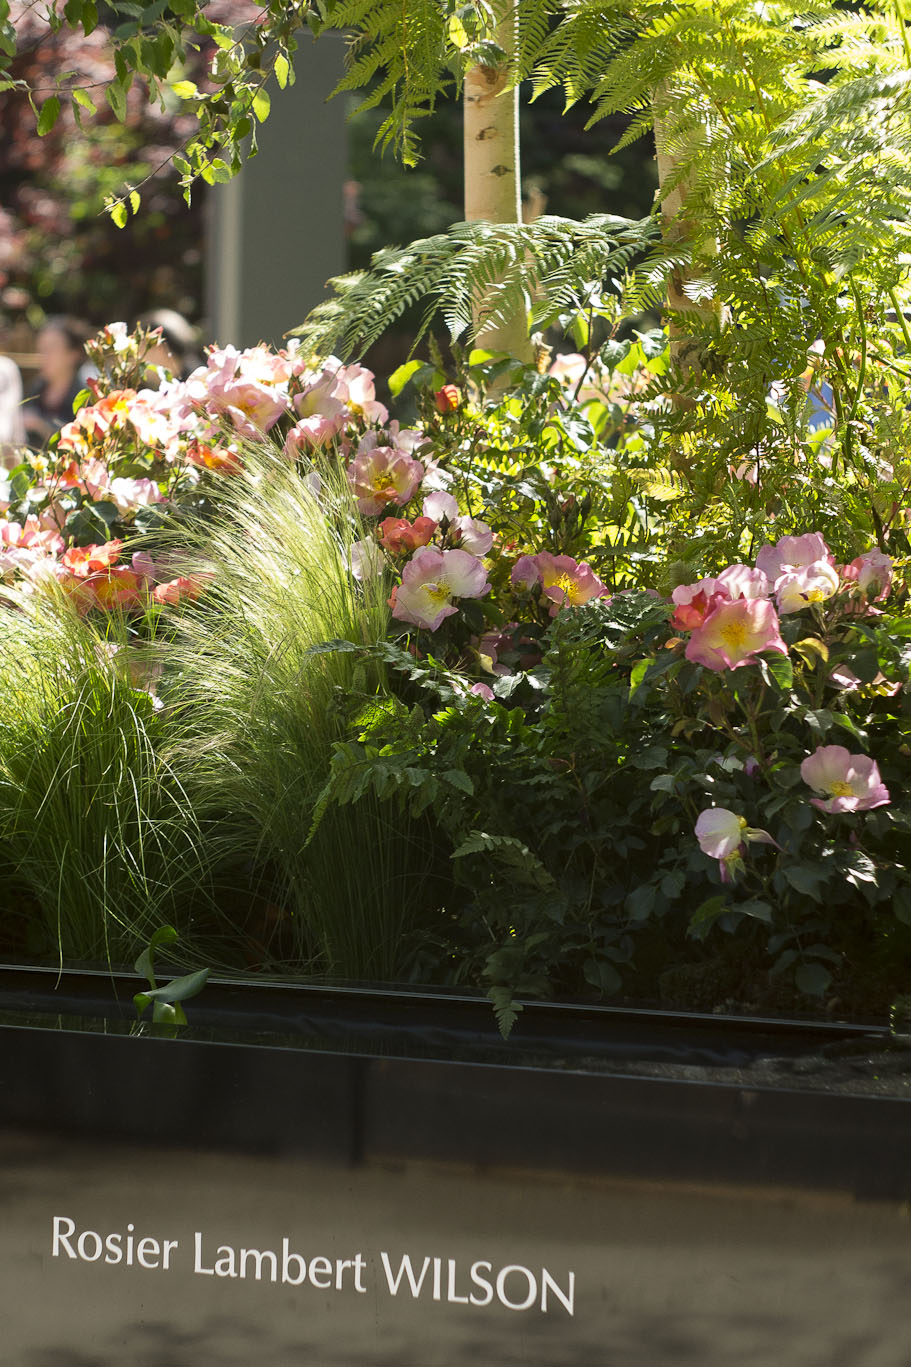 Le nouveau rosier lambert wilson par truffaut jardins for Jardins jardin 2015